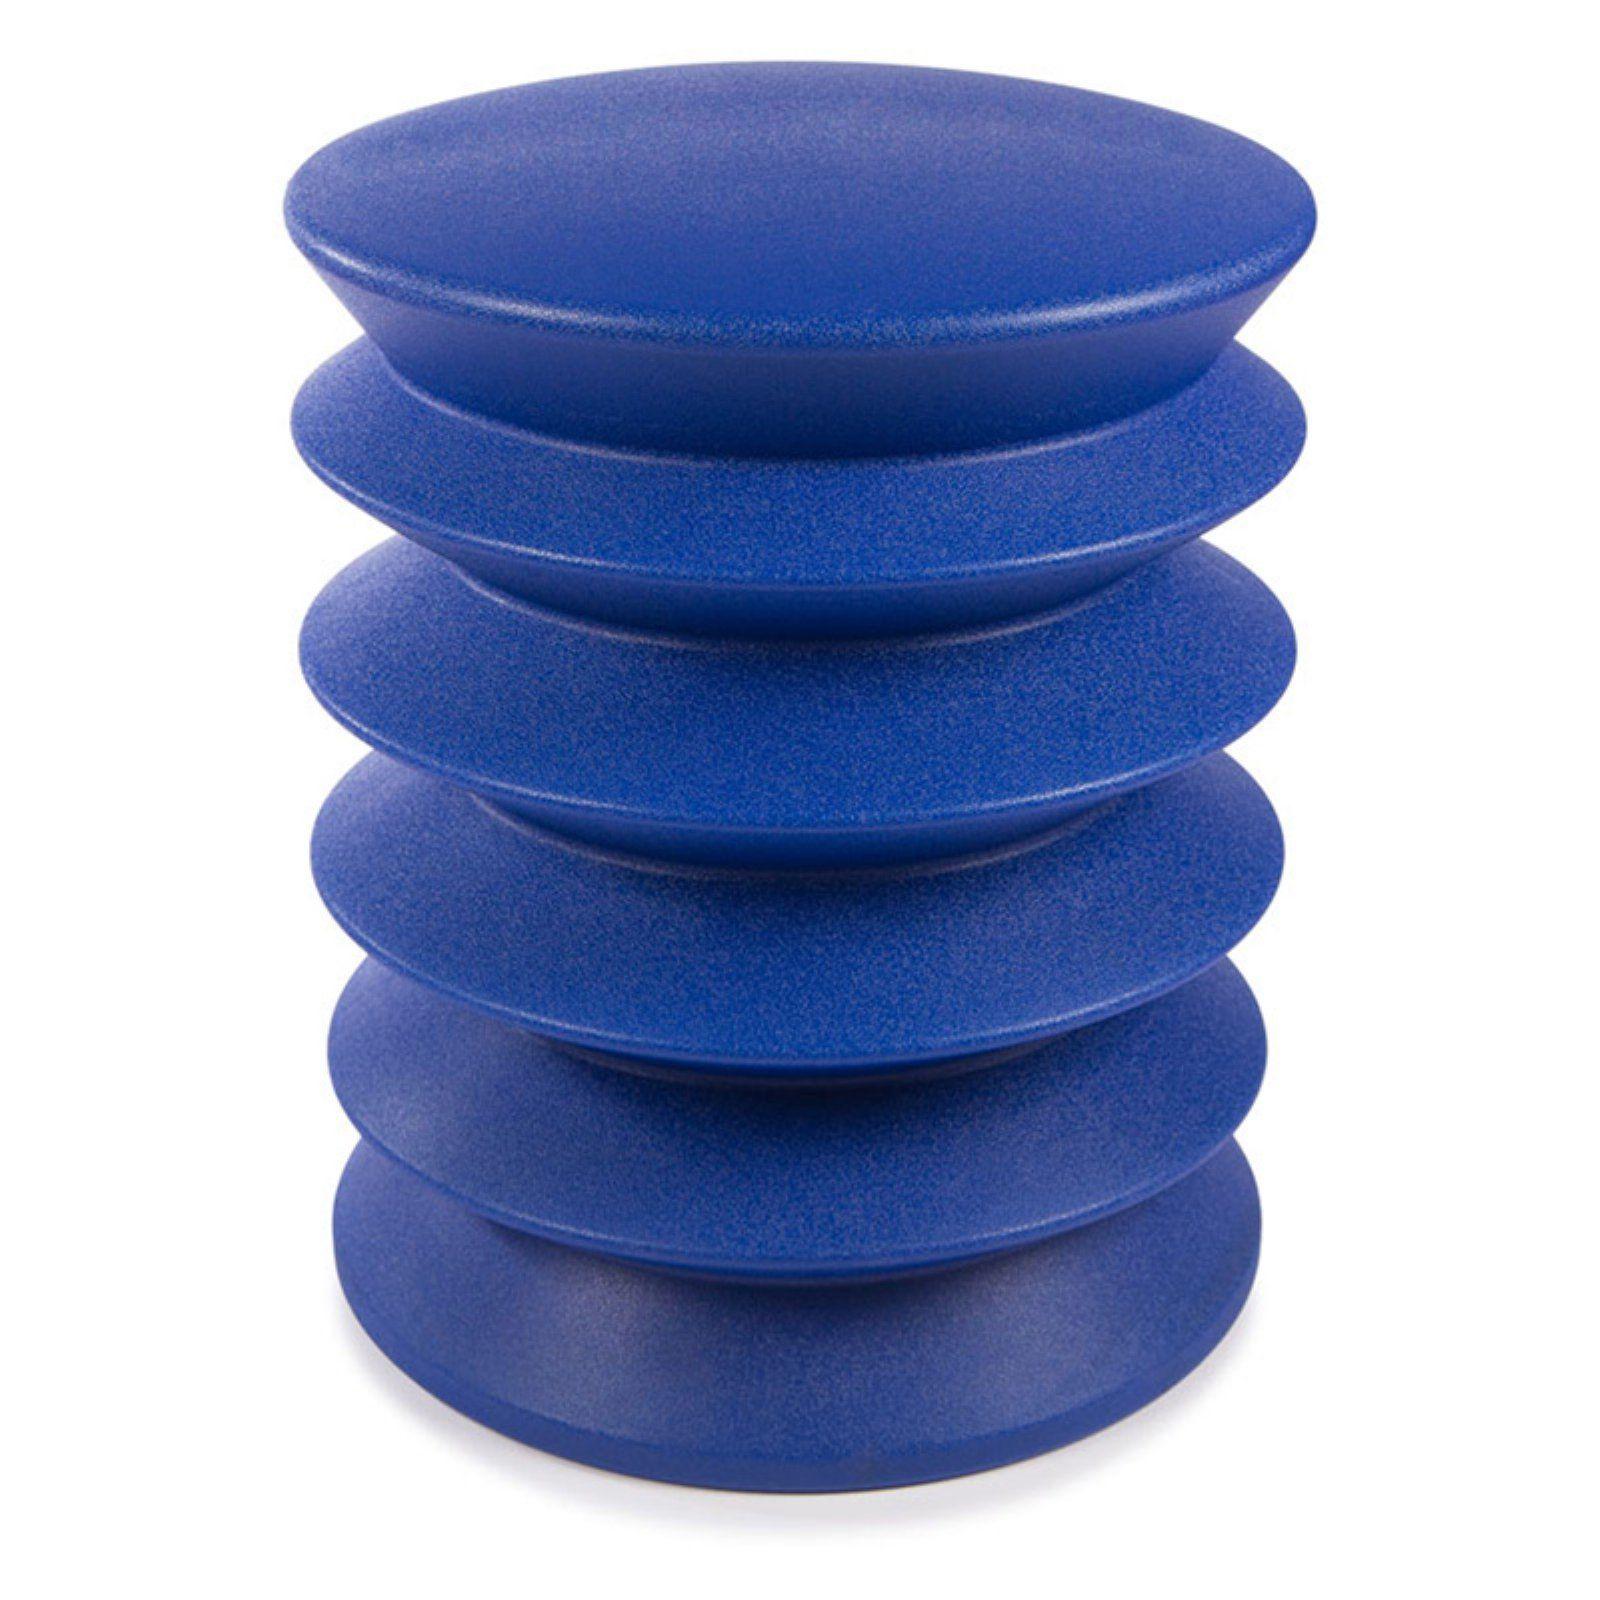 ErgoErgo Active Sitting Stool Blue in 2019 Ergonomic